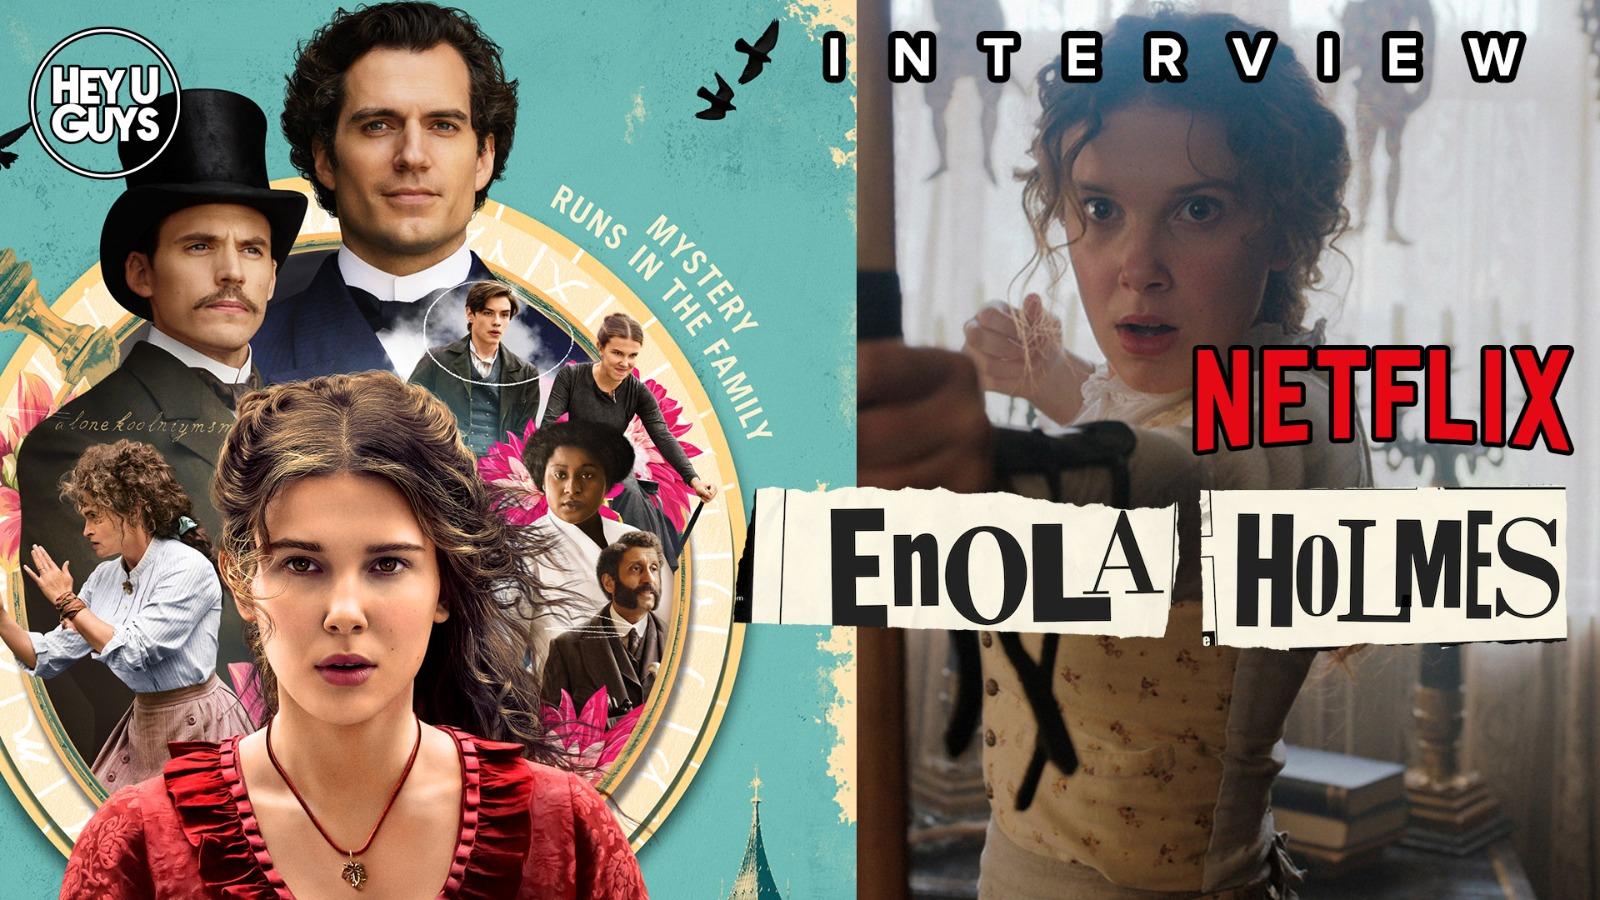 enola holmes cast interviews